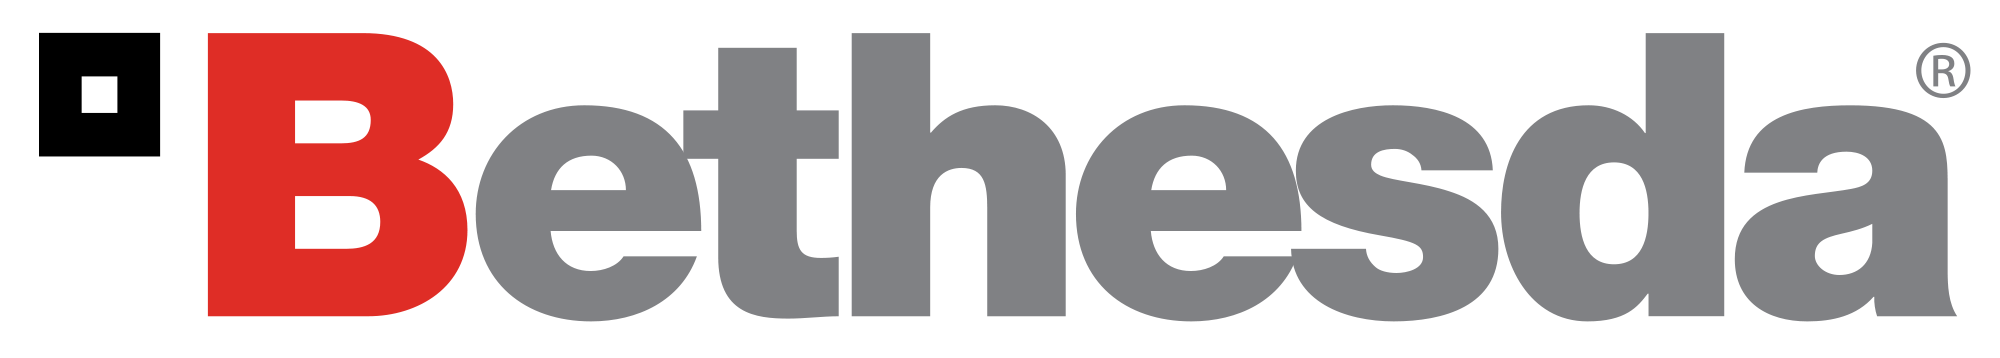 IMAGE(https://wholesgame.com/wp-content/uploads/Bethesda-Softworks-Logo-Wallpaper-2000px-PNG.png)